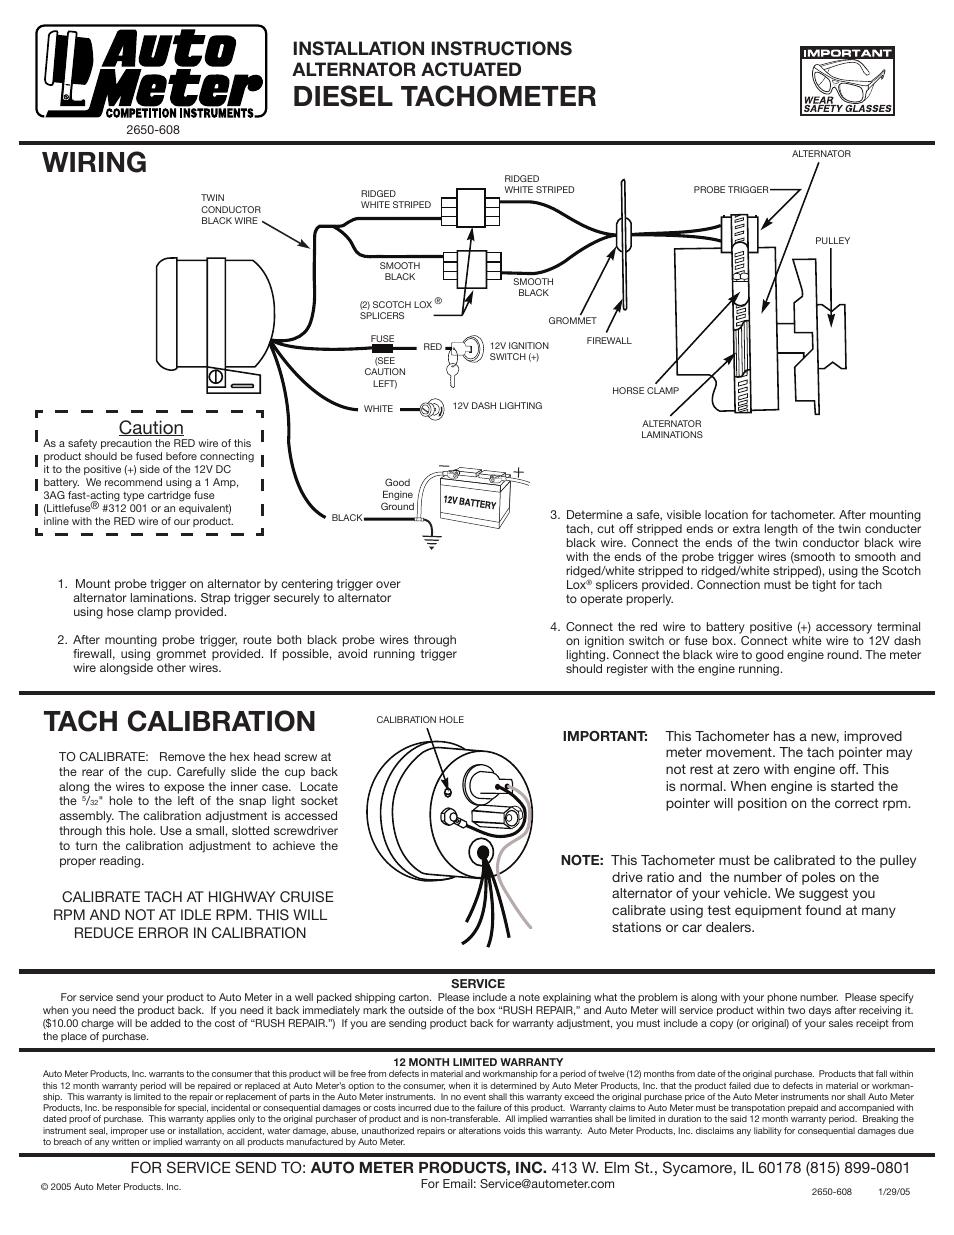 medium resolution of briggs engine tachometer wiring instructions auto meter youtubeautometer tach wiring schematic zu eokcrftu medicinalbeauty info